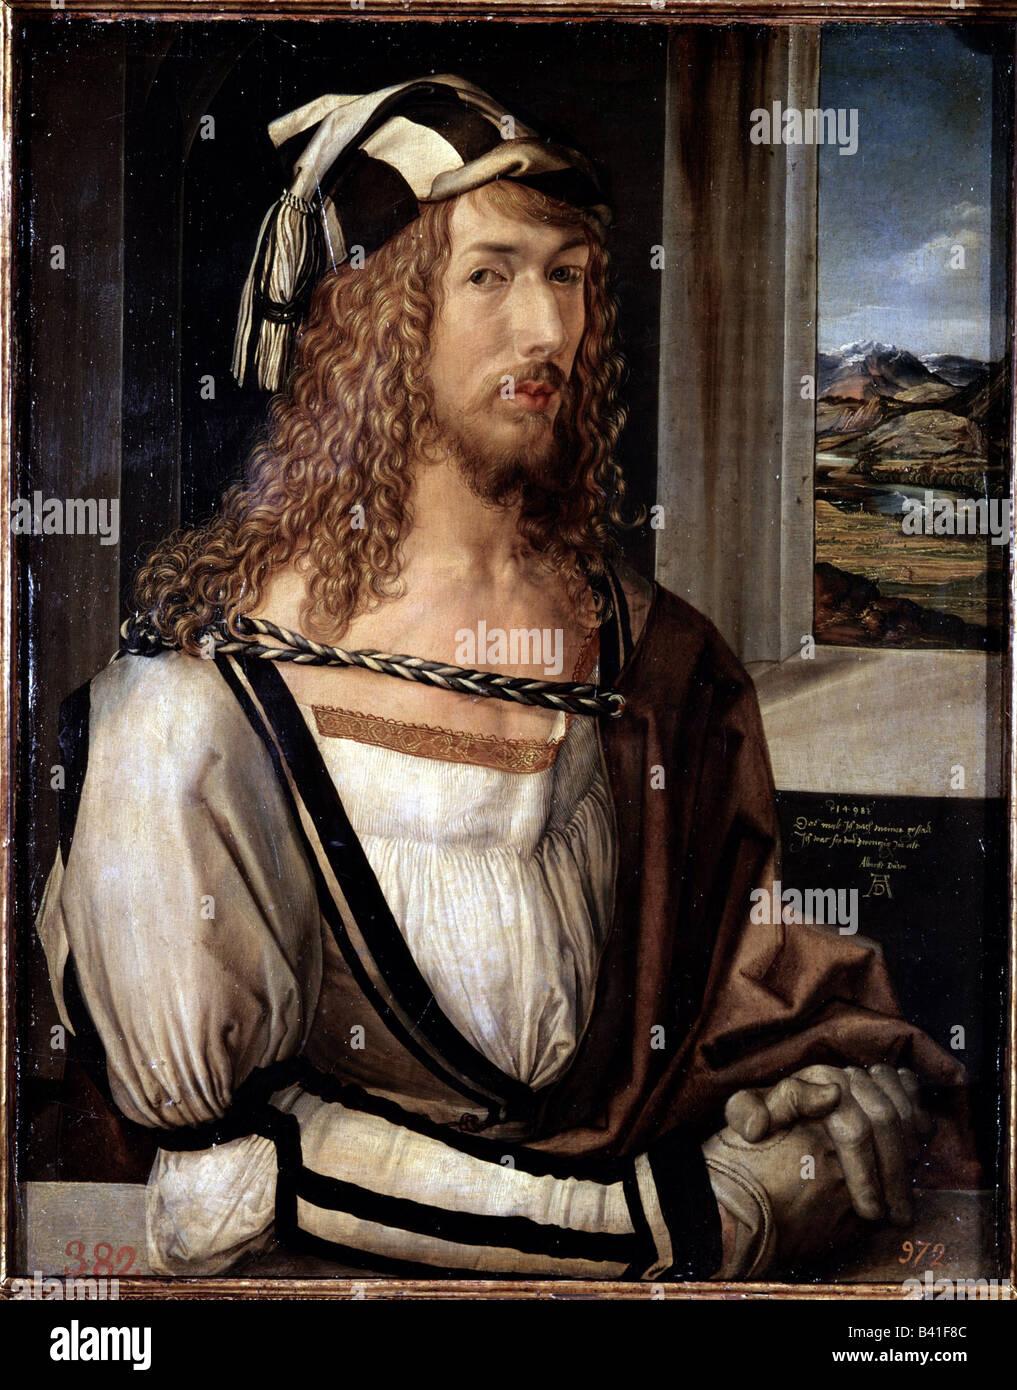 "Fine Arts - Dürer, Albrecht (1471-1528), Gemälde ""Selbstbildnis Mit Landschaft"" Selbstbildnis, Stockbild"